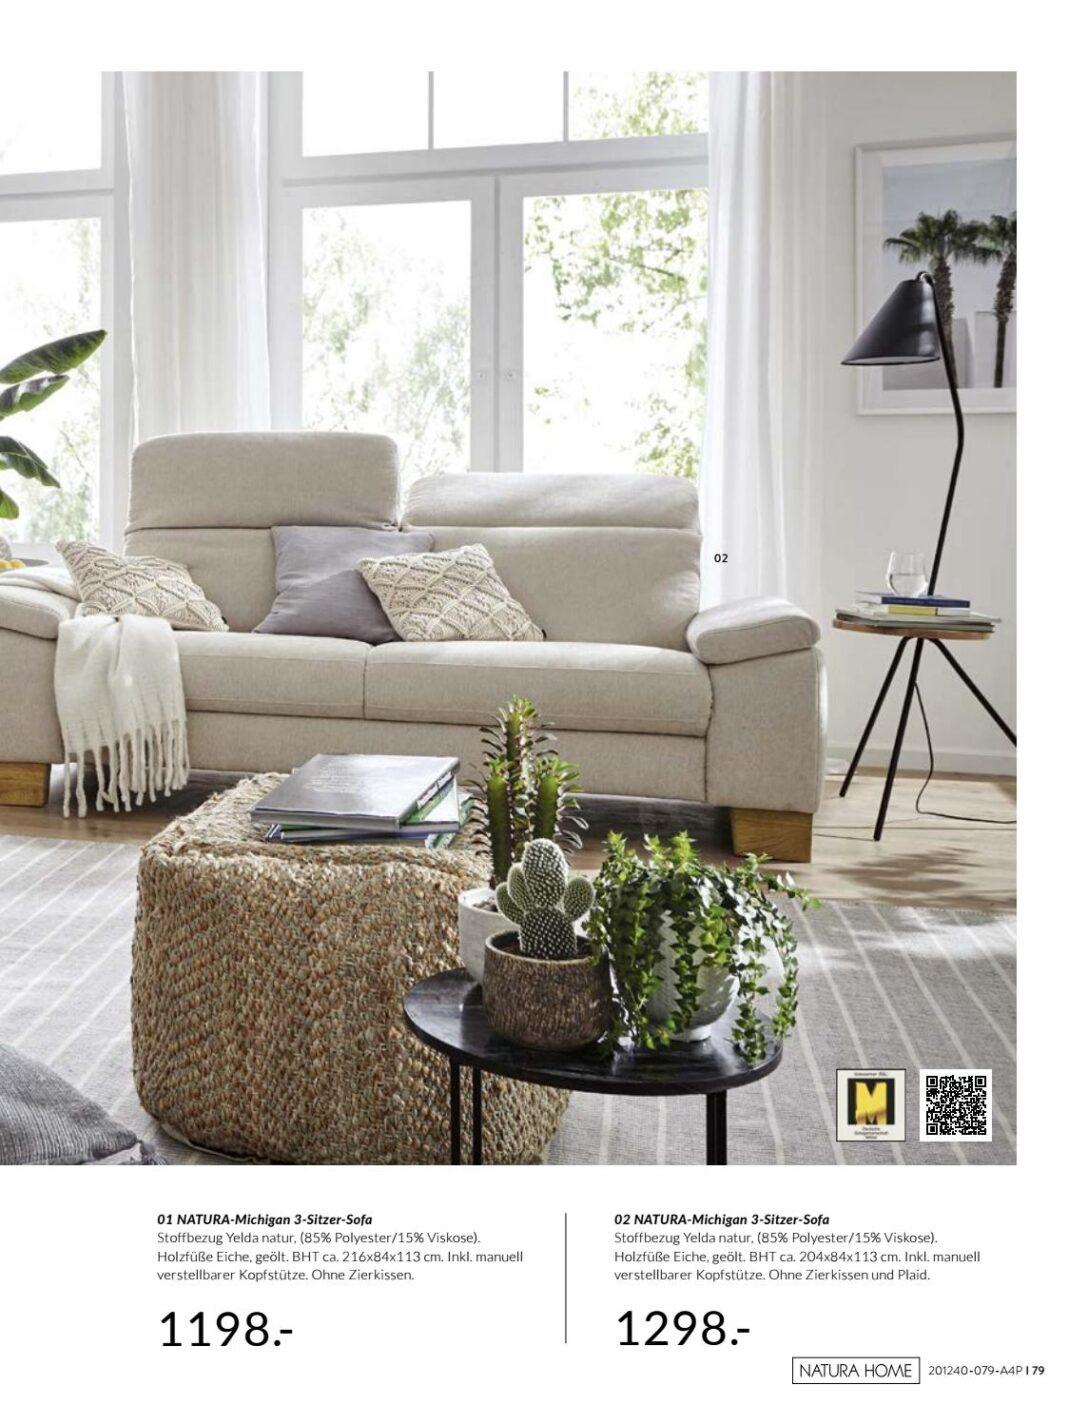 Large Size of Natura Sofa Gebraucht Home Denver Pasadena Livingston Kaufen Newport Couch Brooklyn Kansas Love By Europa Mbel Verbund Gmbh Federkern Modernes 3er Grau Xxl Sofa Natura Sofa